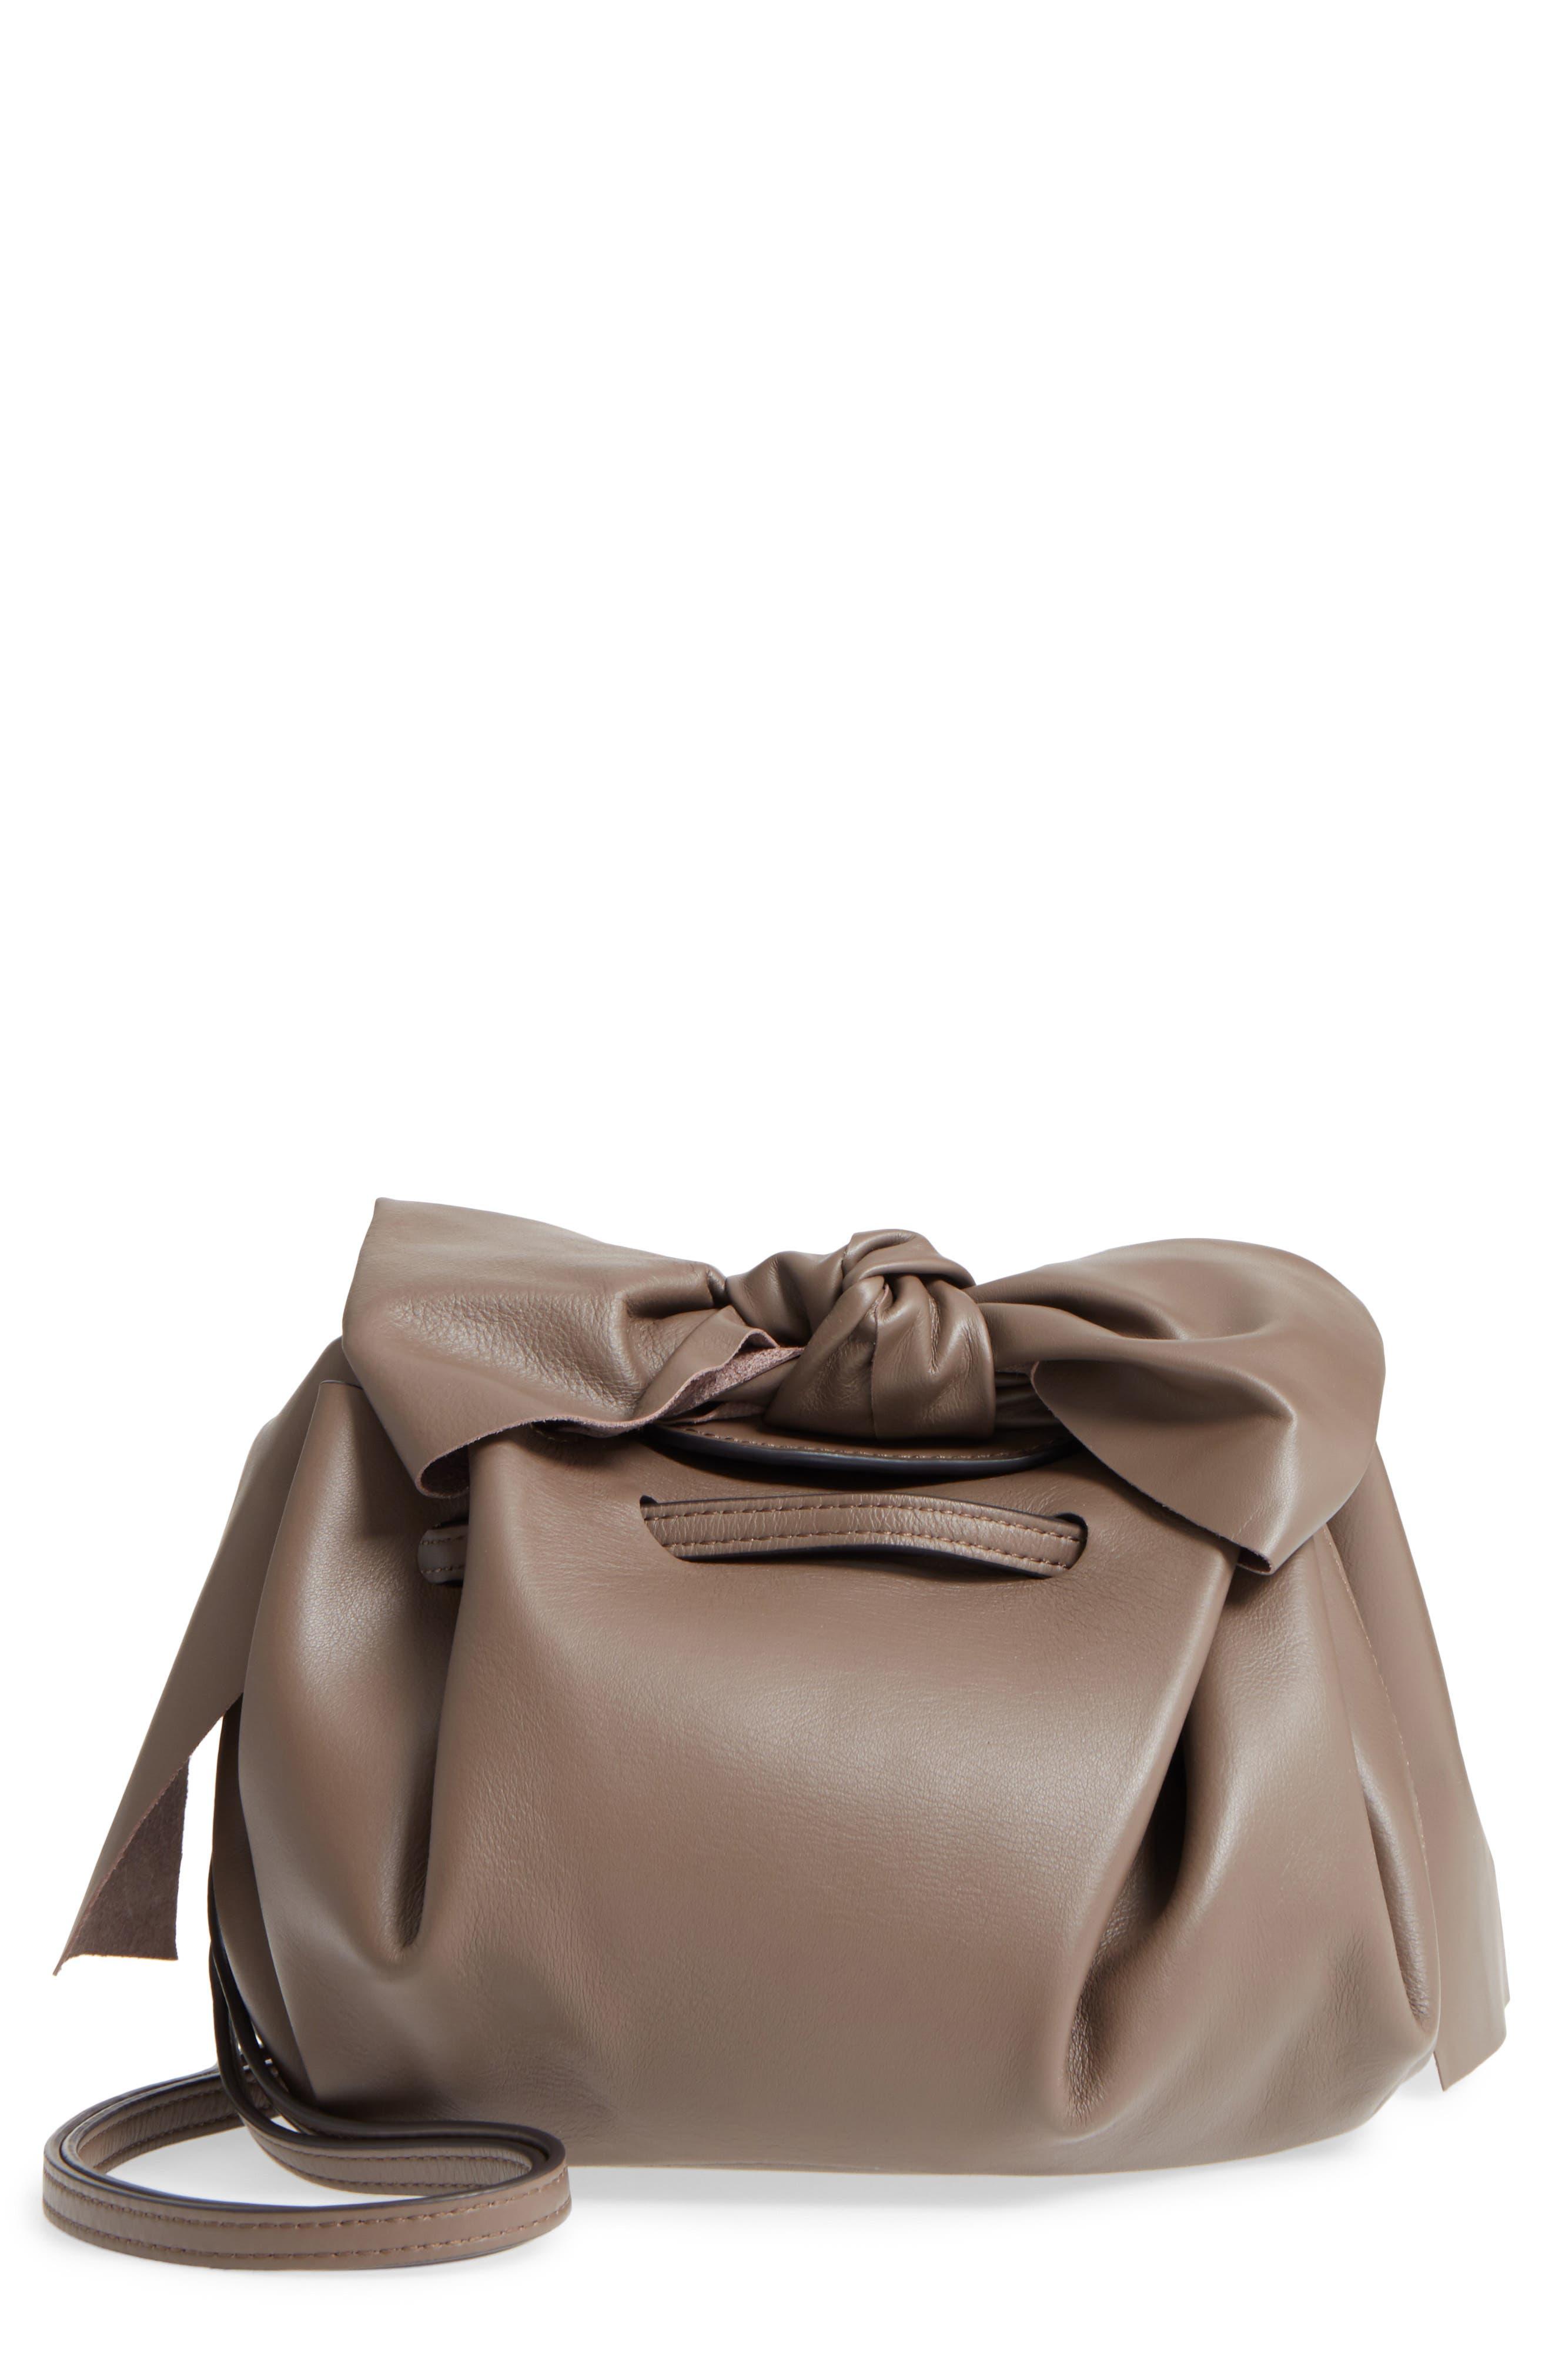 Soiree Leather Crossbody Bag,                             Main thumbnail 1, color,                             Mockingbird